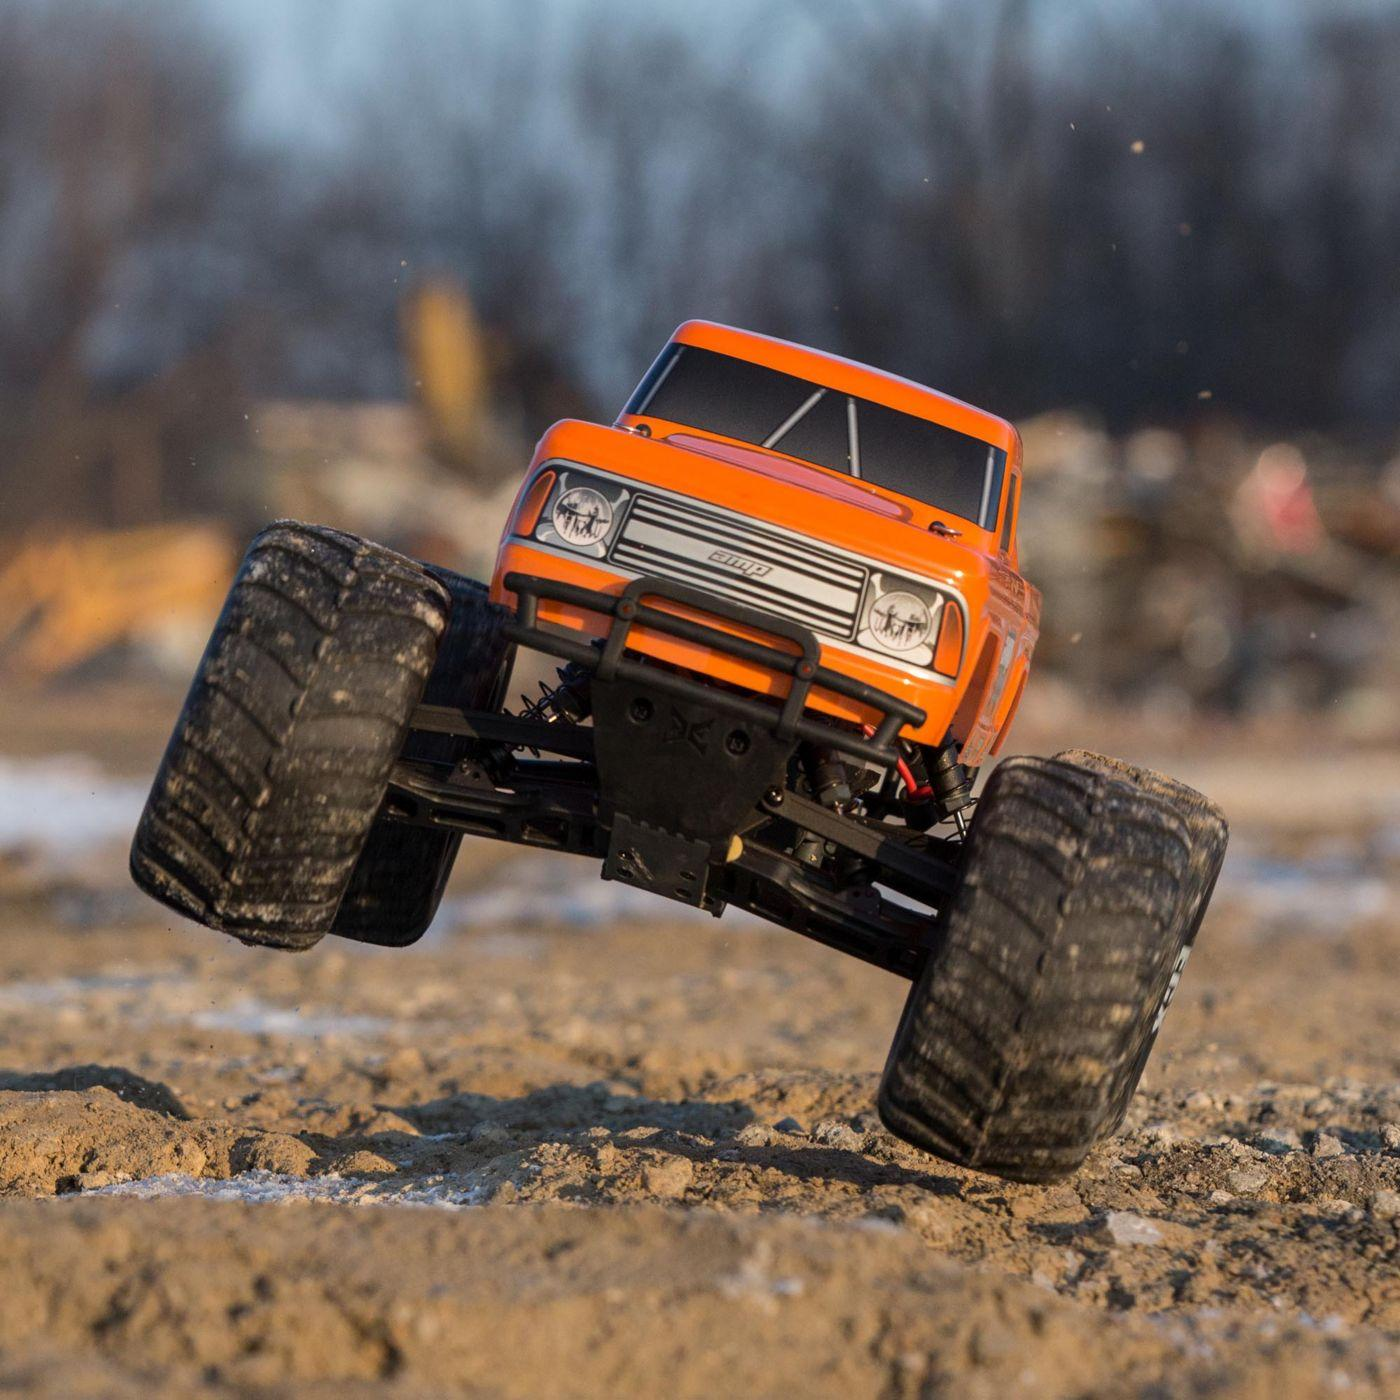 Amp Crush 2WD Monster Truck | ECX